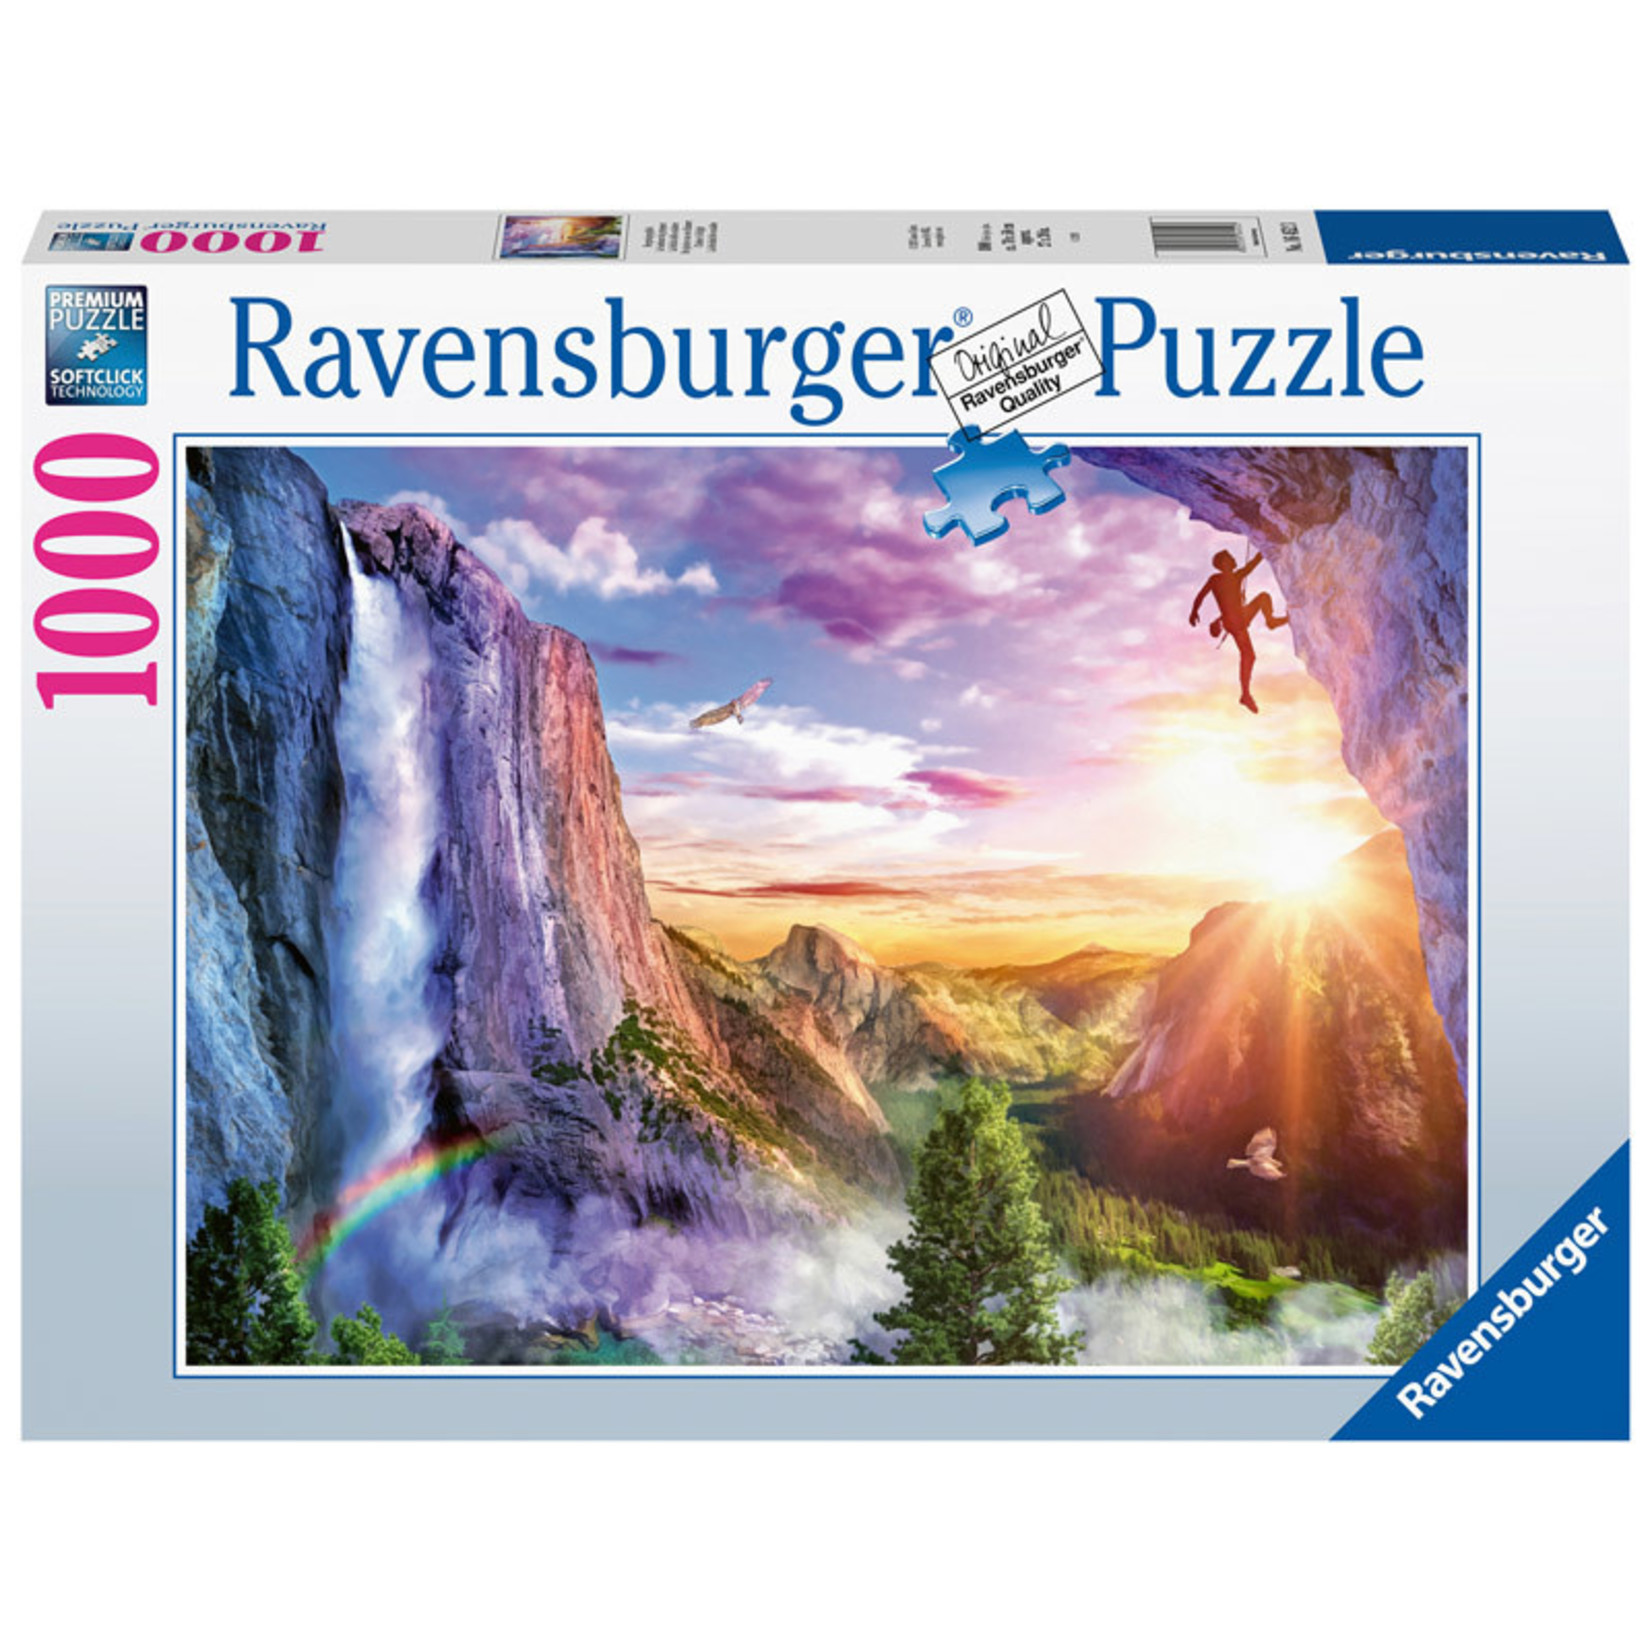 Ravensburger Climber's Delight 1000pc